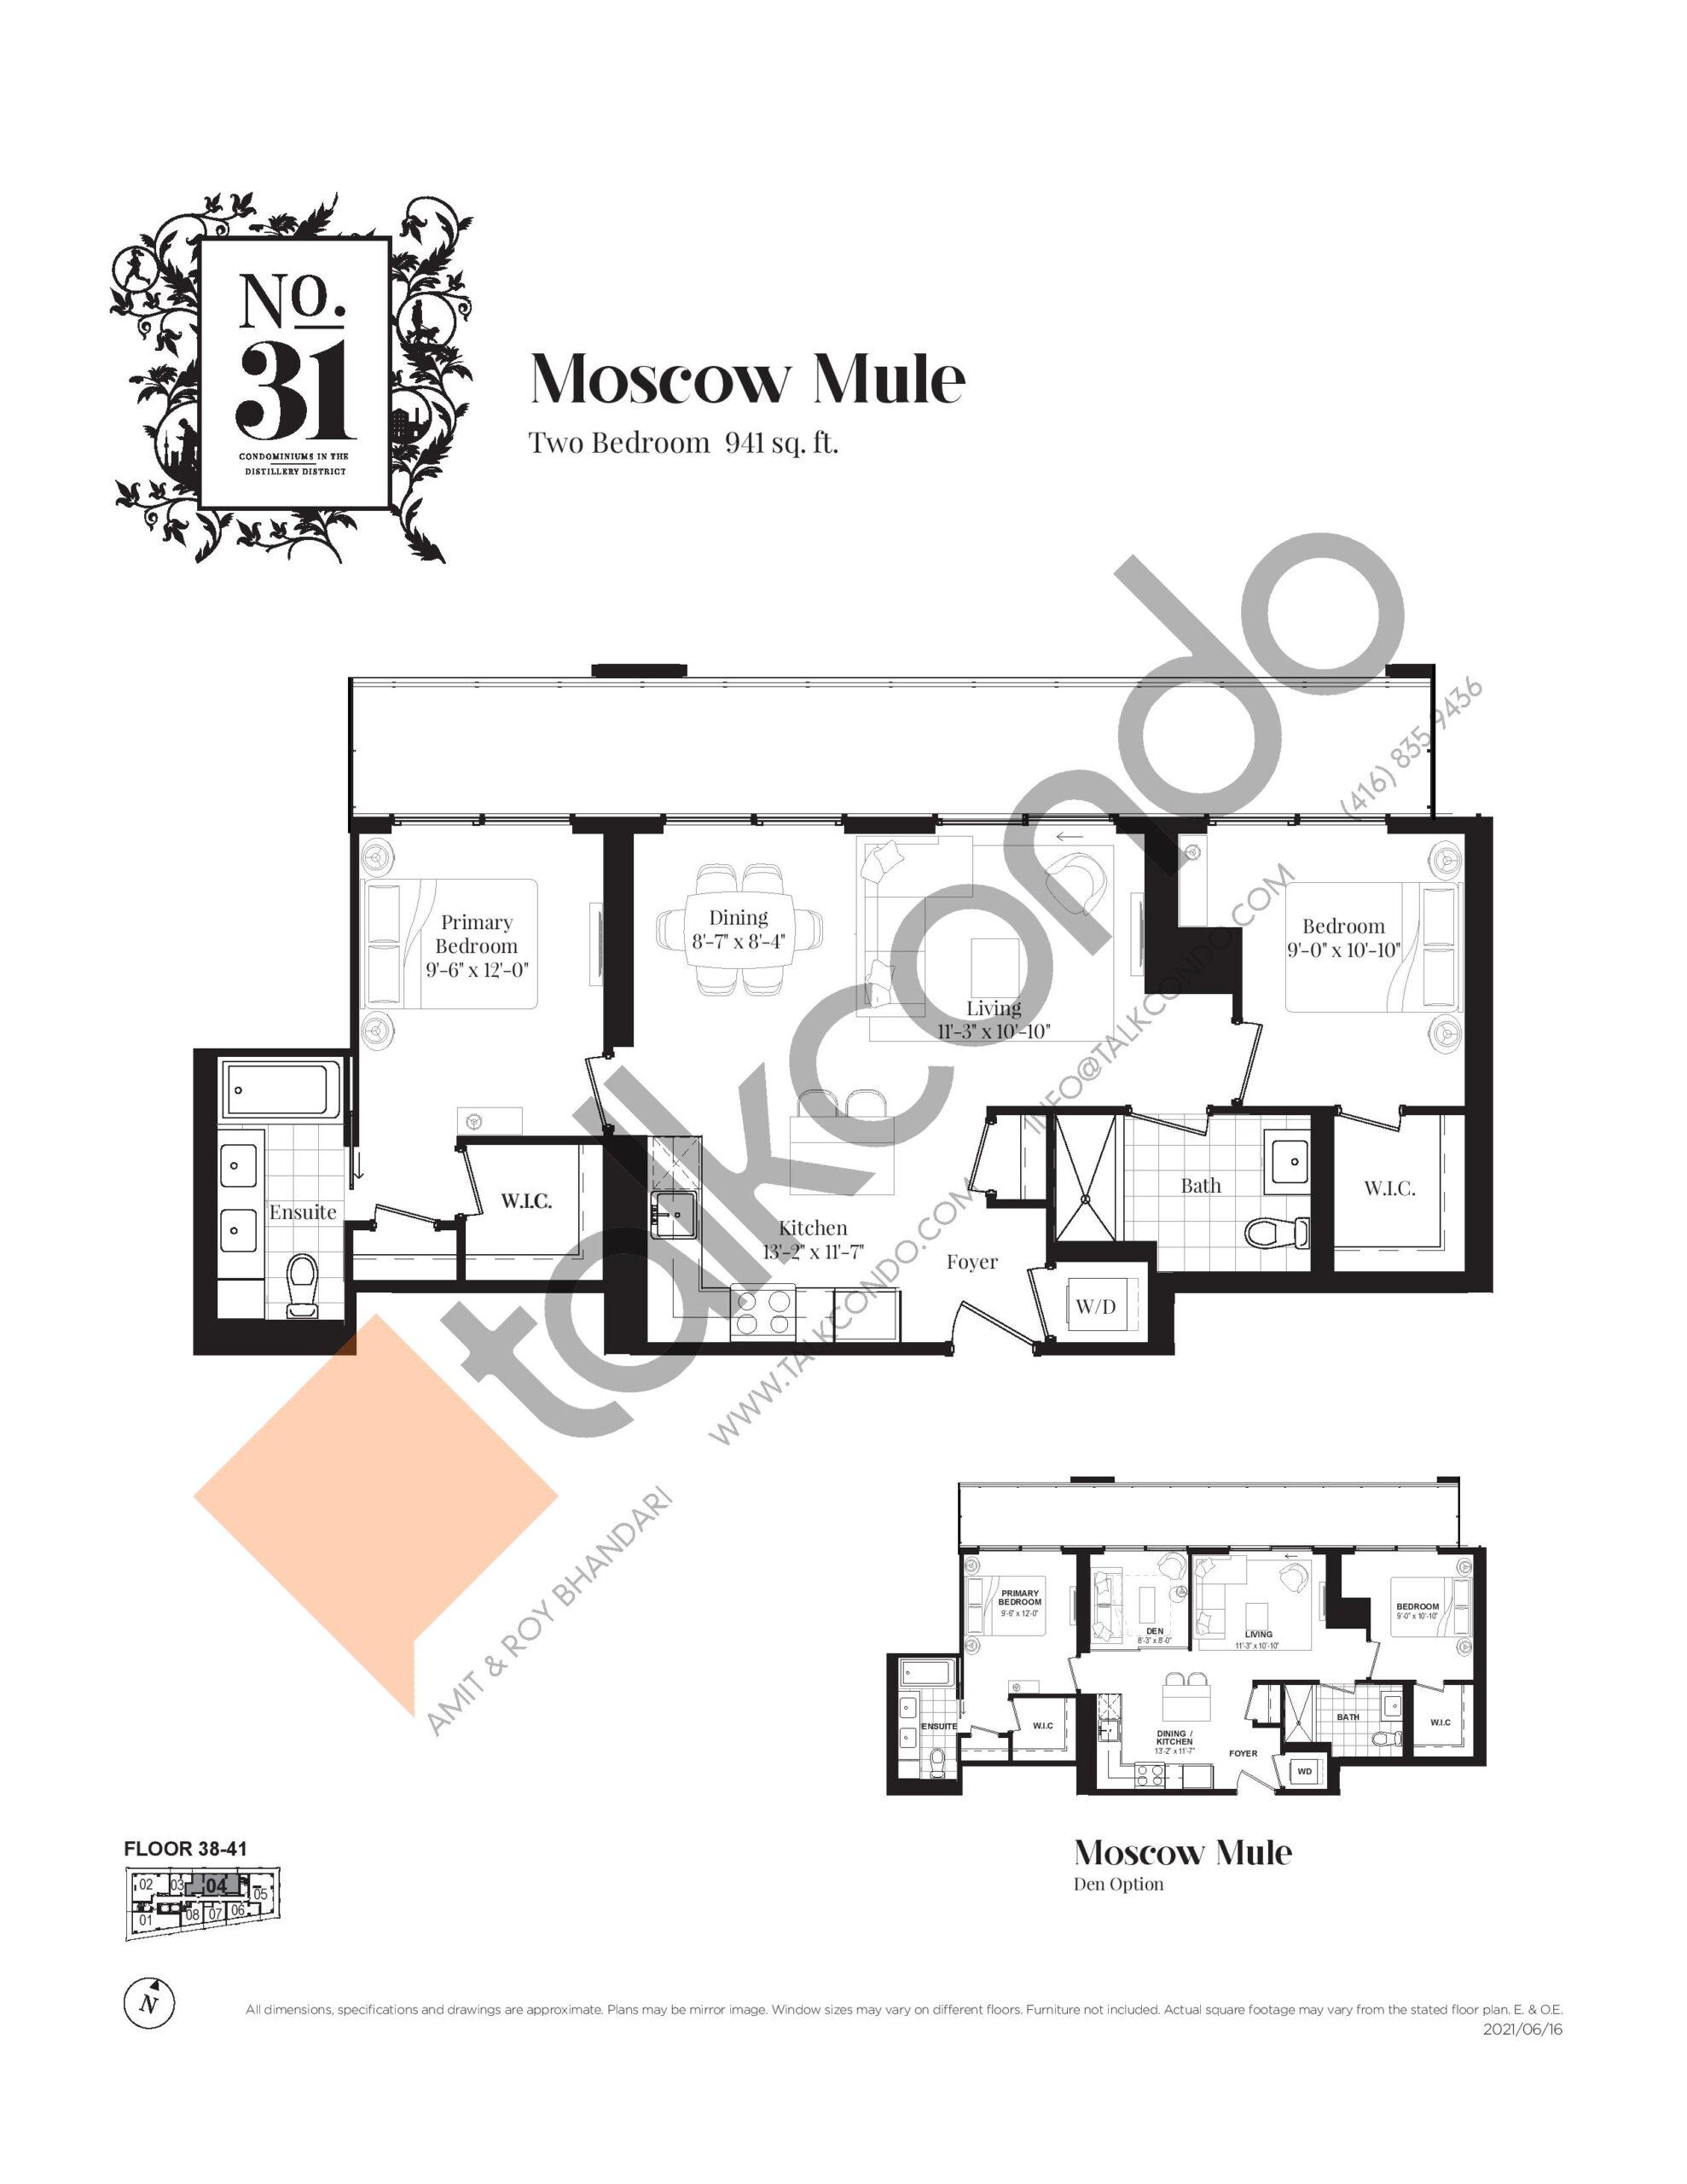 Moscow Mule Floor Plan at No. 31 Condos - 941 sq.ft